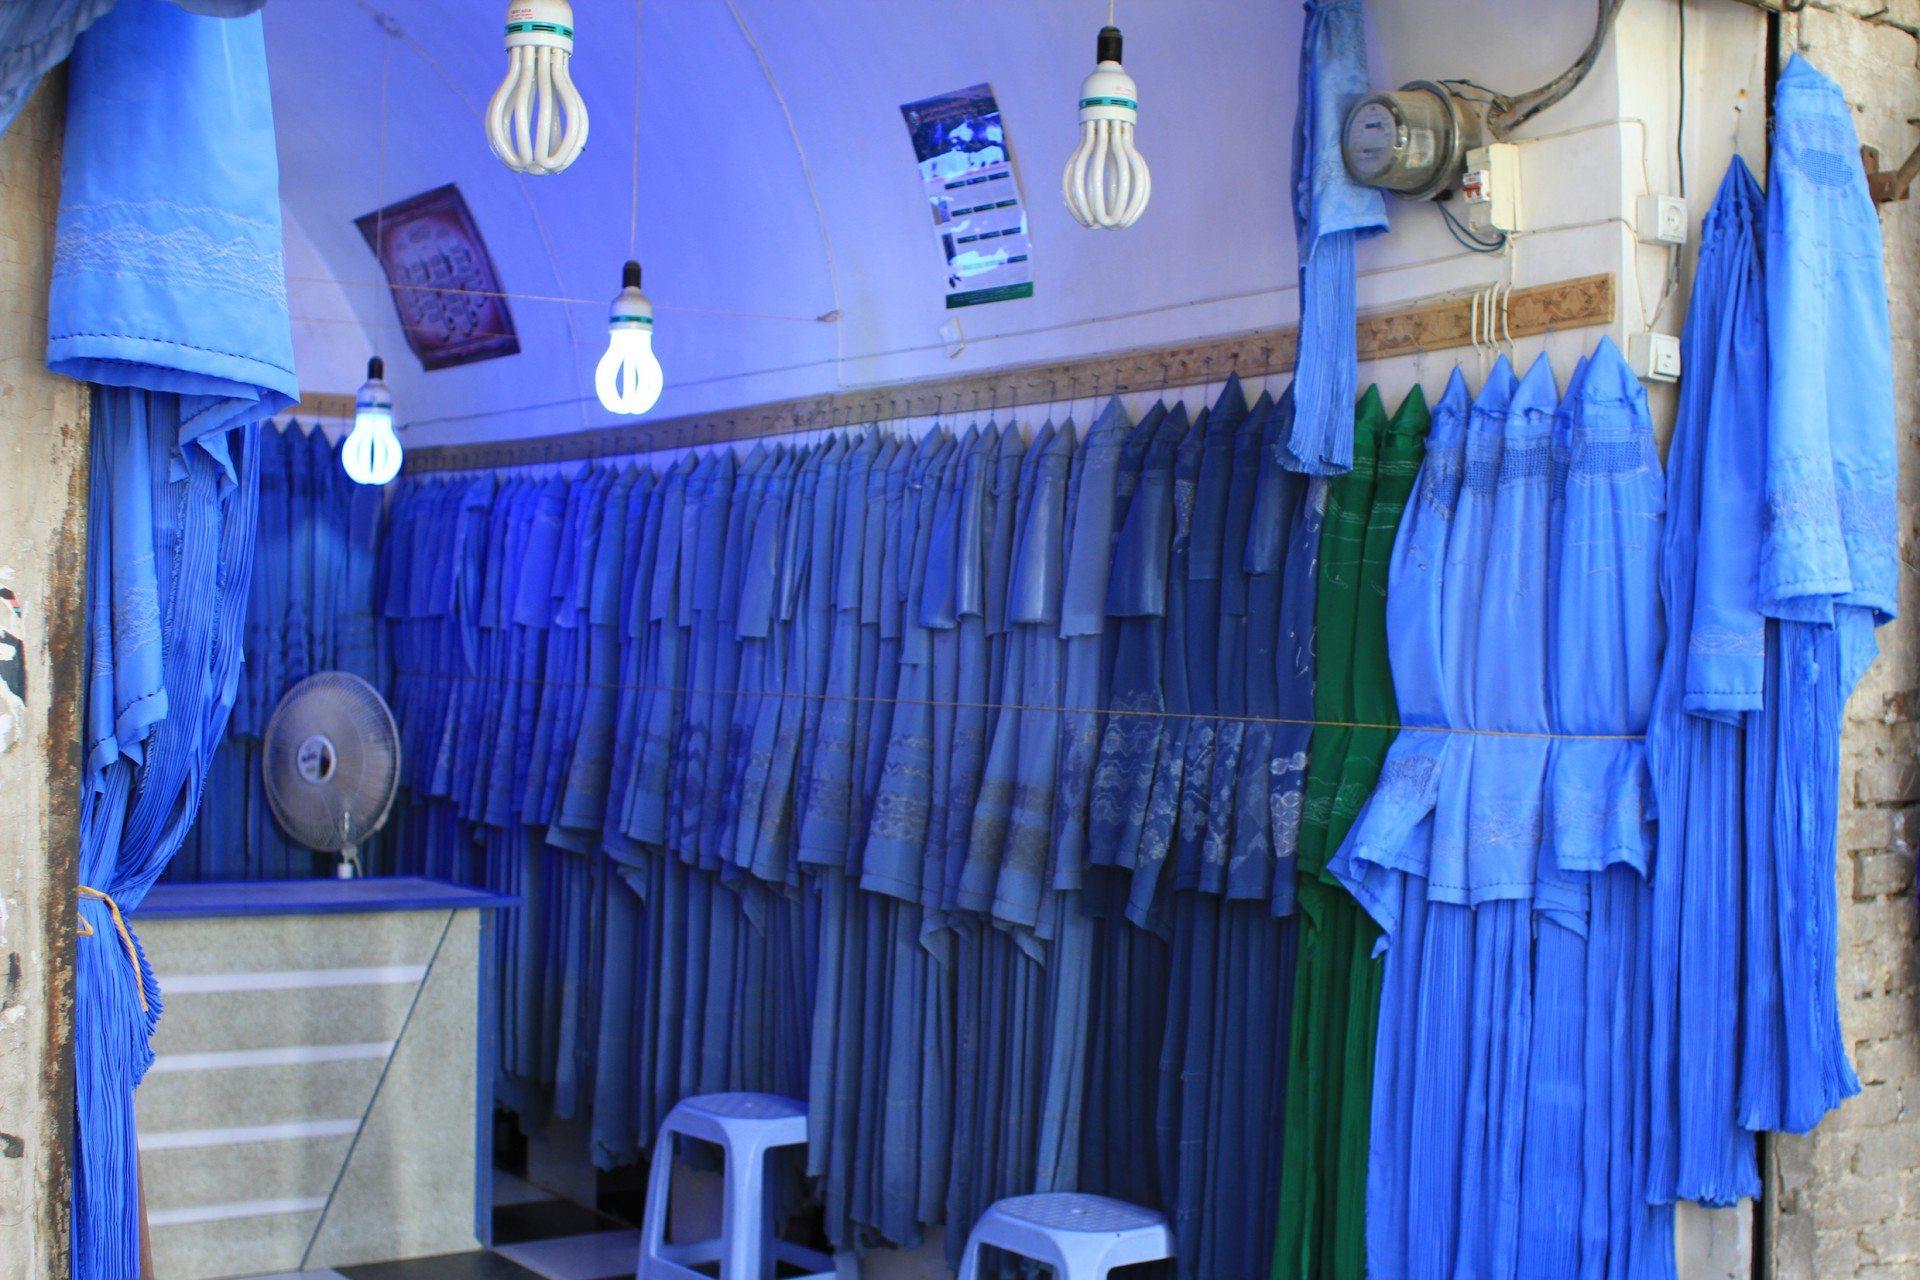 Der Klamottenladen. Burkaverkauf in Herat